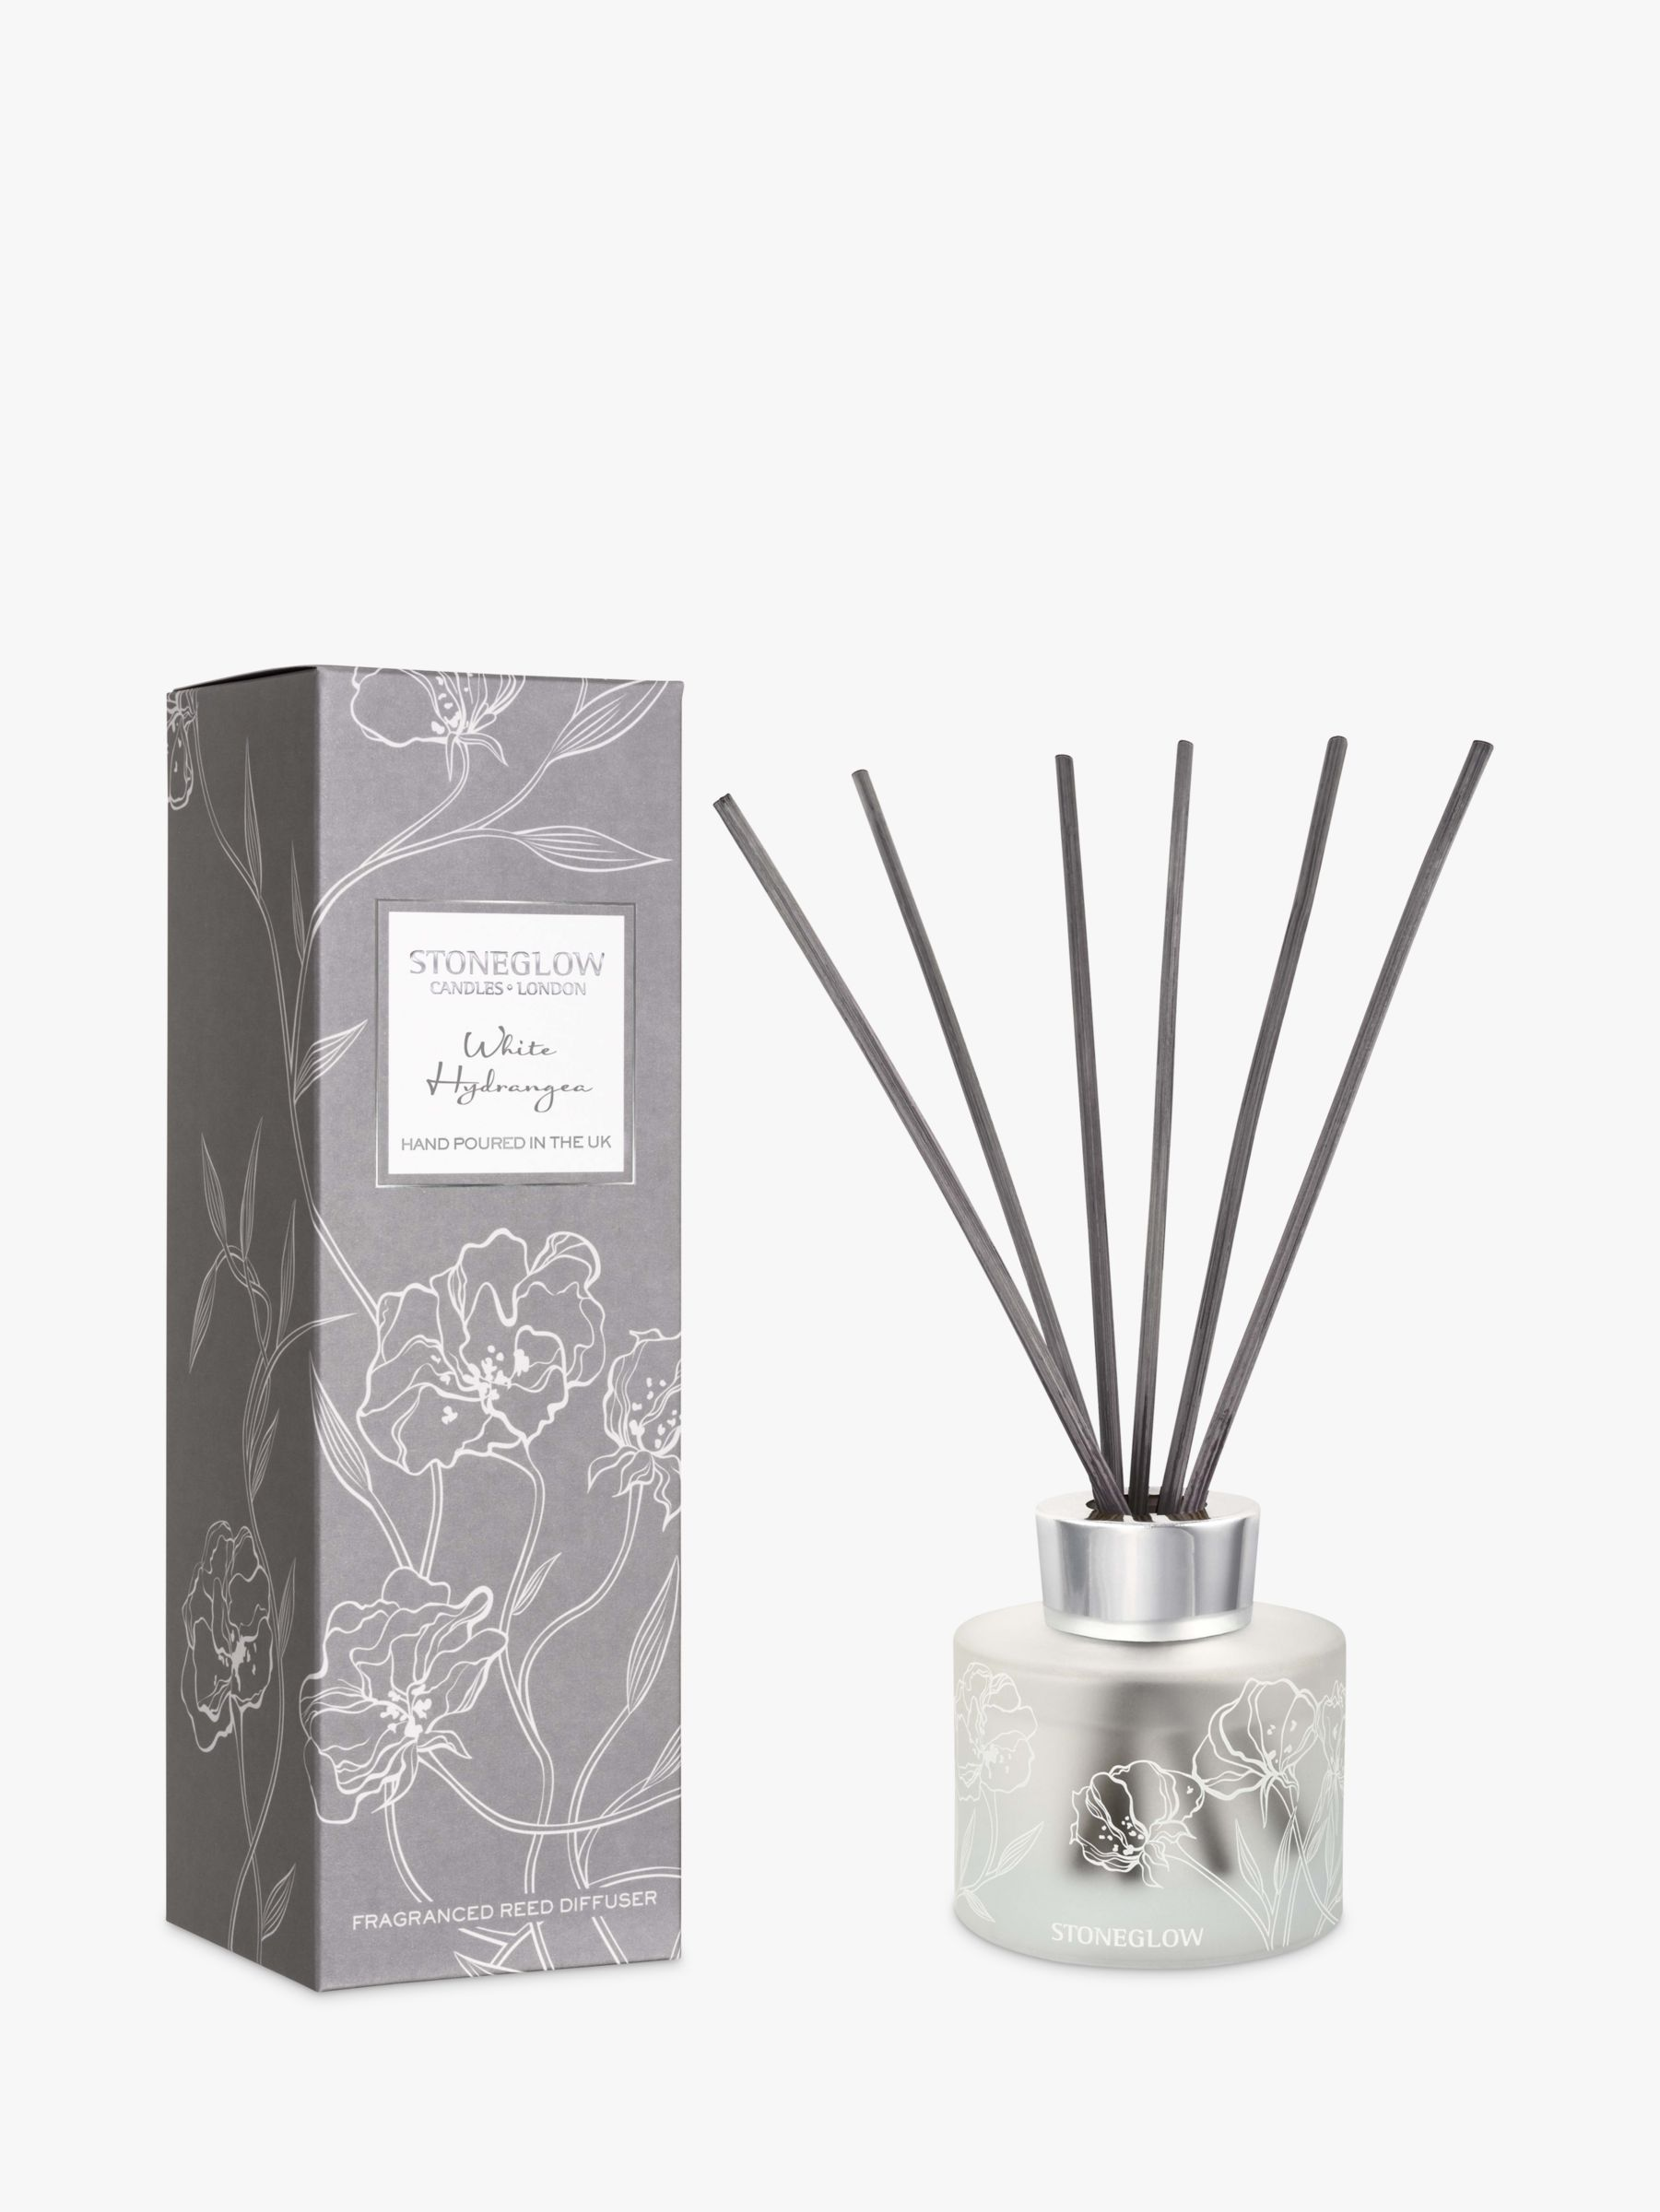 Stoneglow Stoneglow Day Flower White Hydrangea Reed Diffuser, 120ml